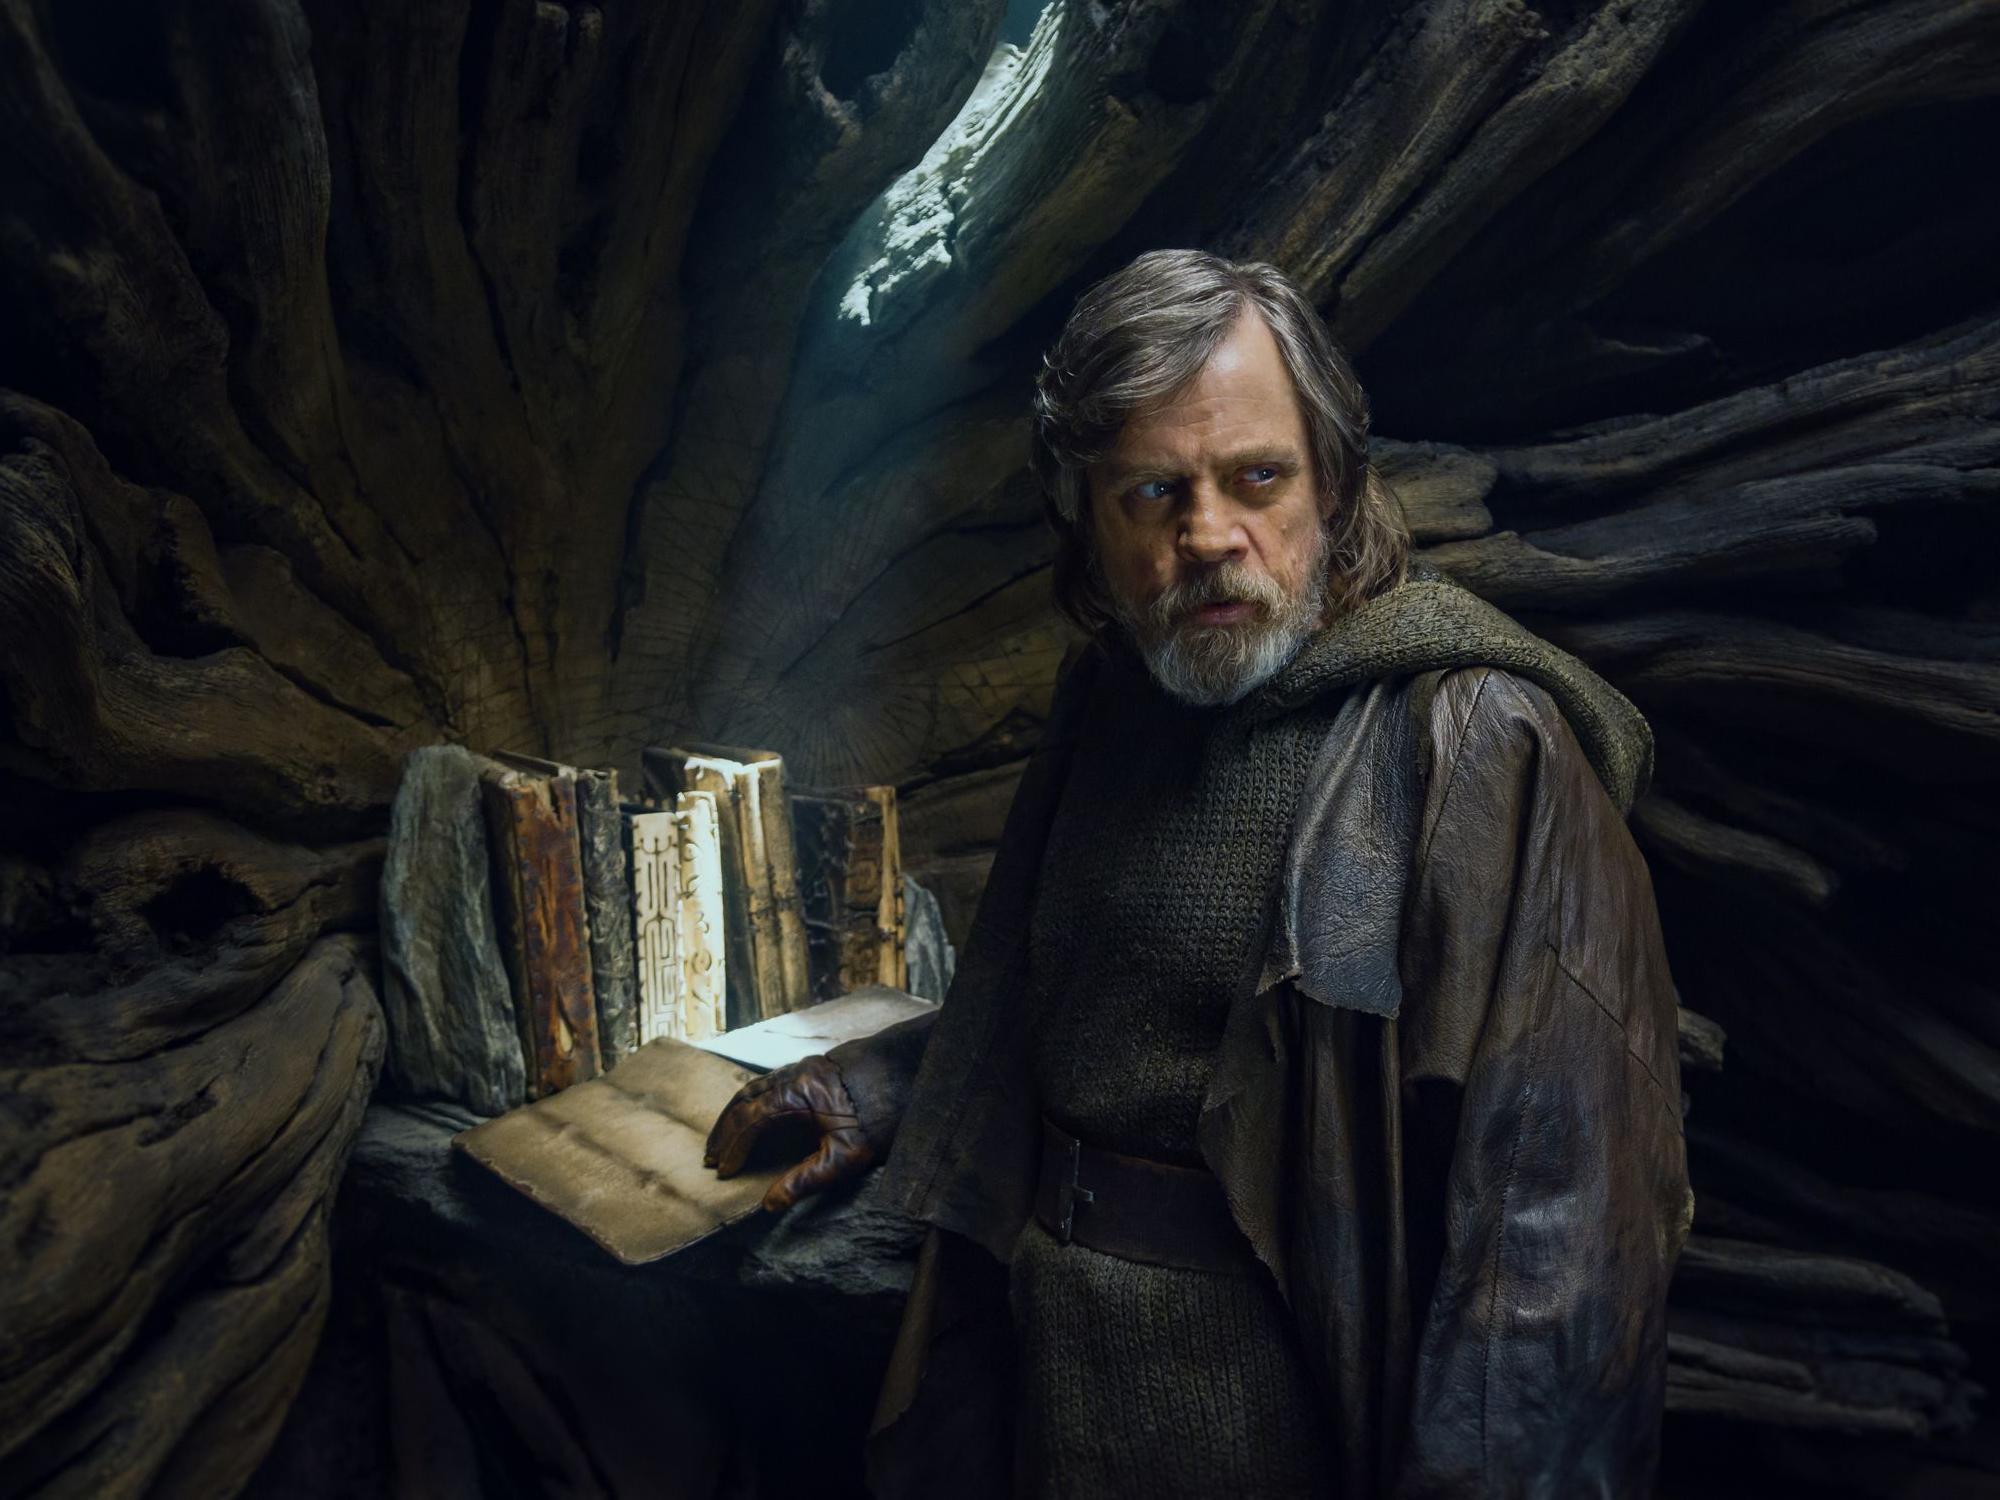 Star-Wards-The-Last-Jedi-film-review.jpg